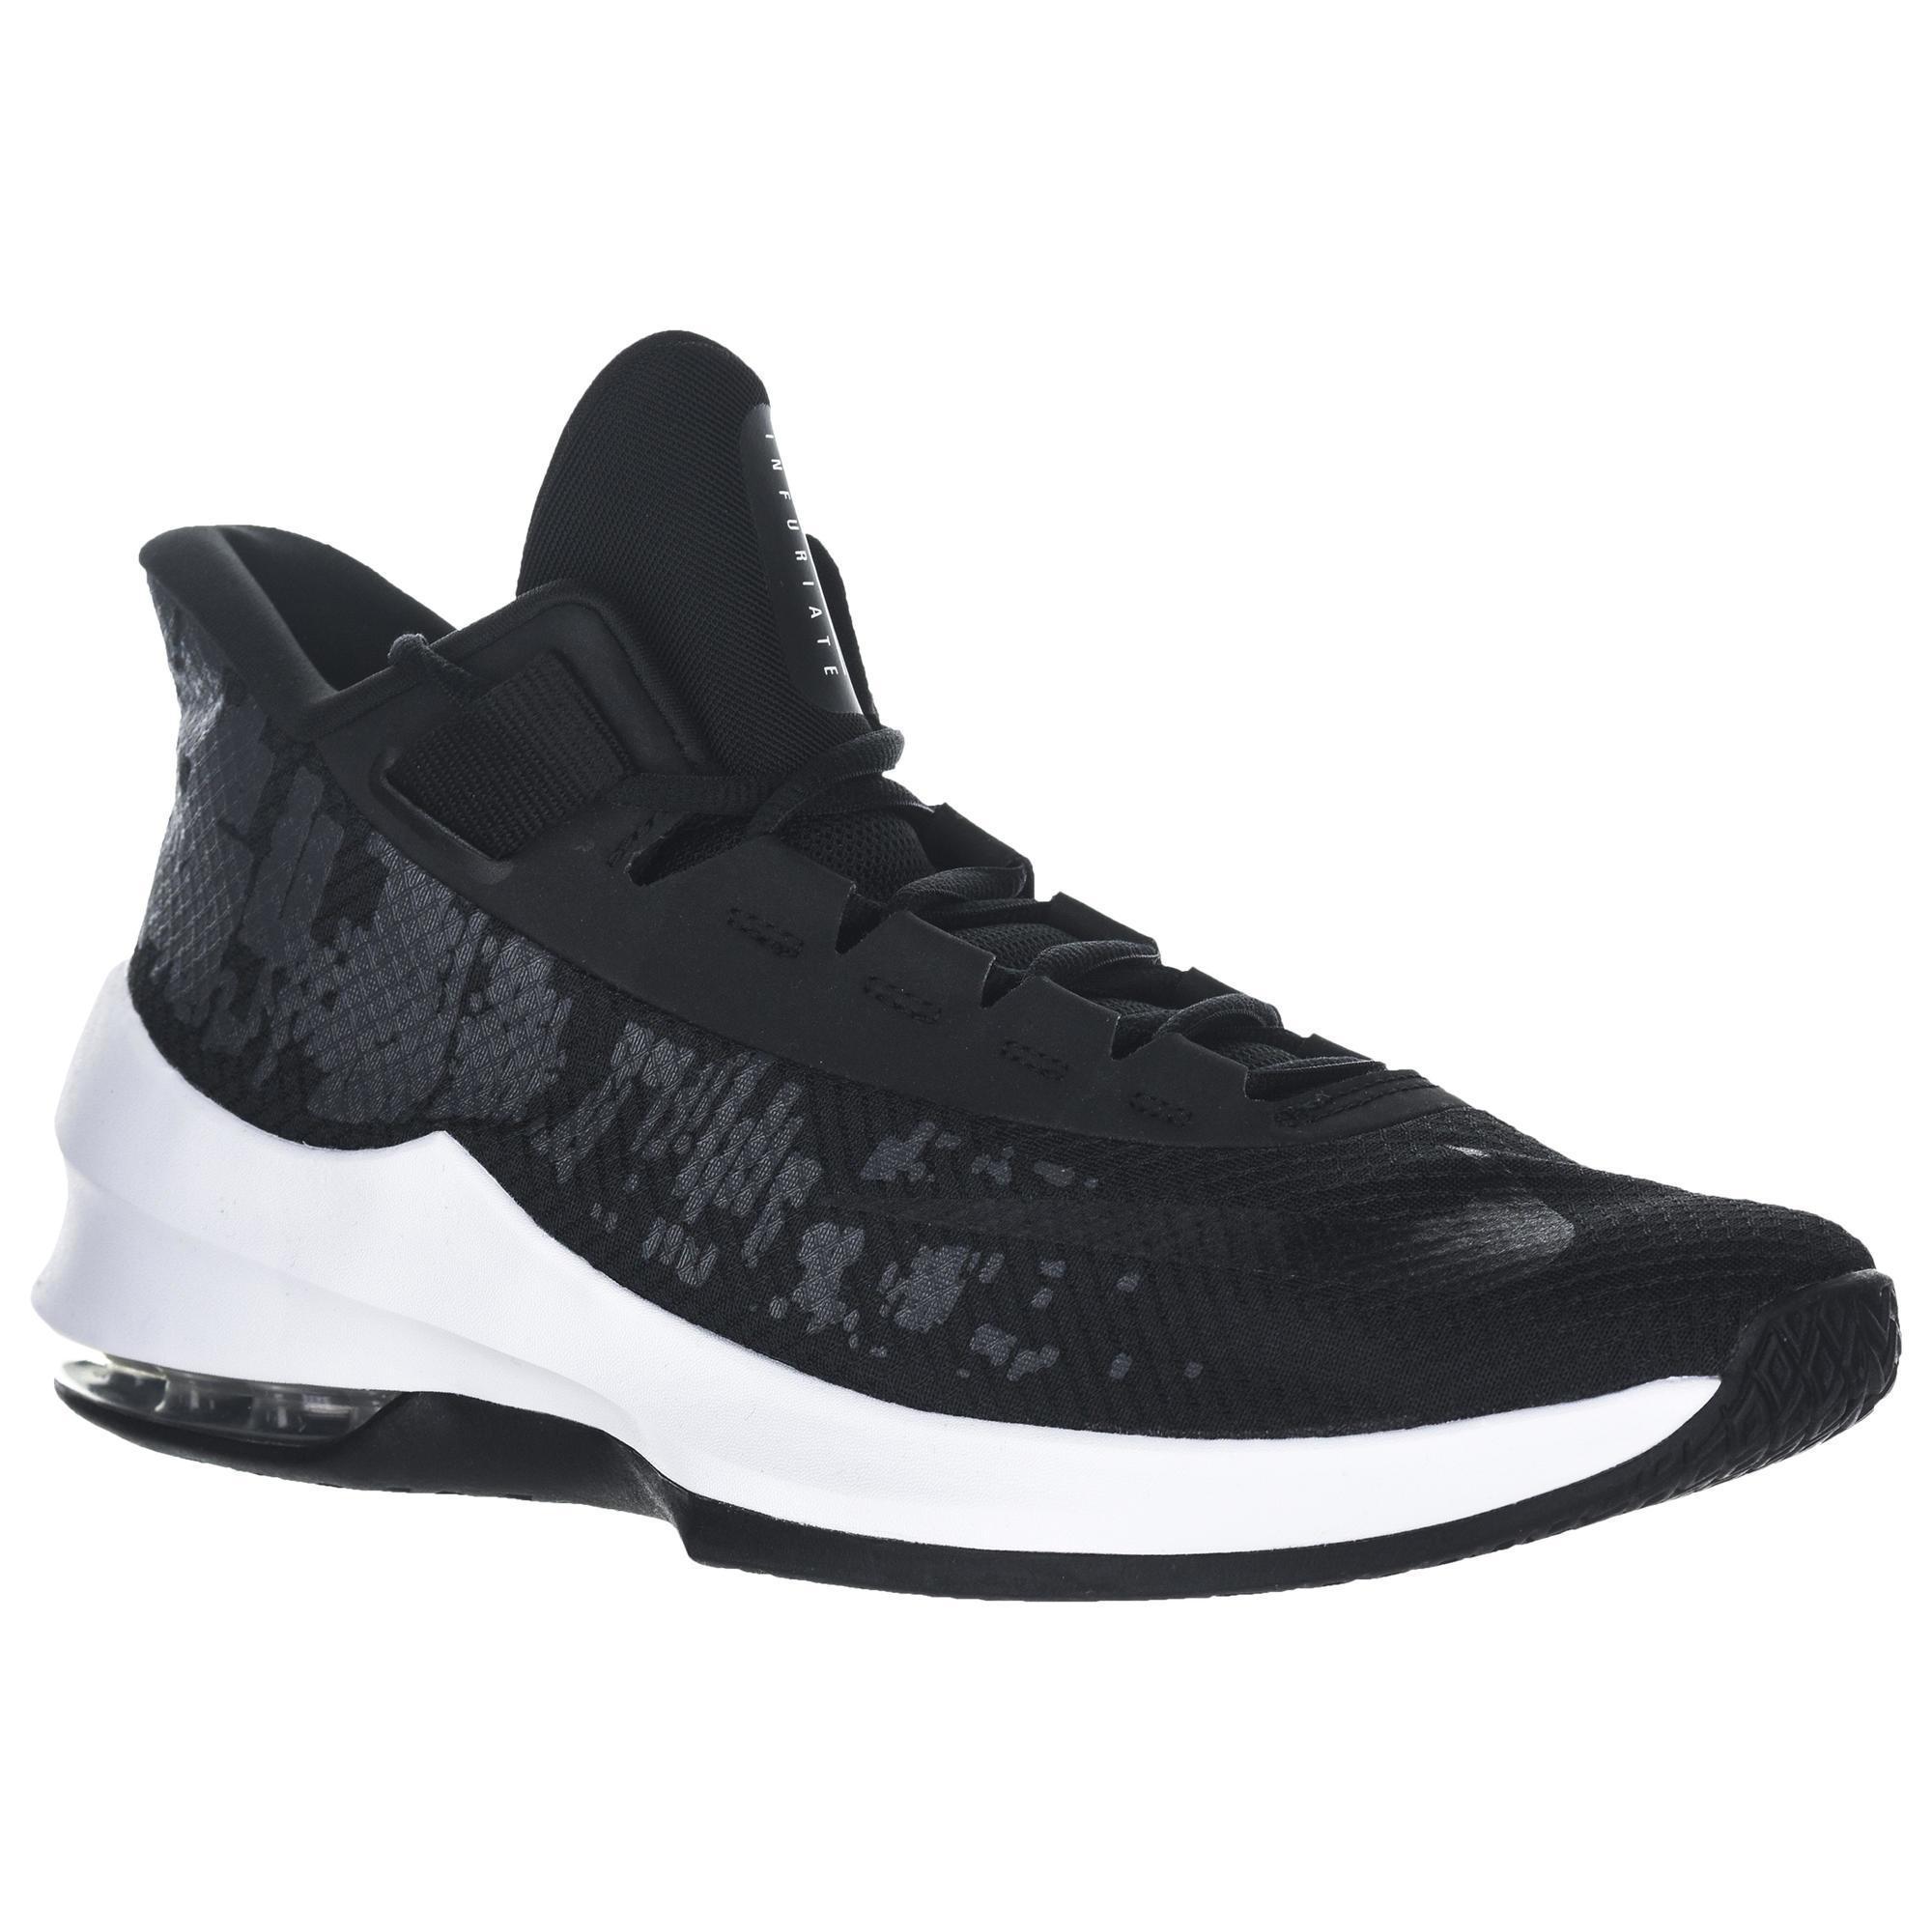 separation shoes a6f89 d63e8 Nike Basketbalschoenen halfgevorderde spelers Air Max Infuriate 2 Mid zwart   Decathlon.nl